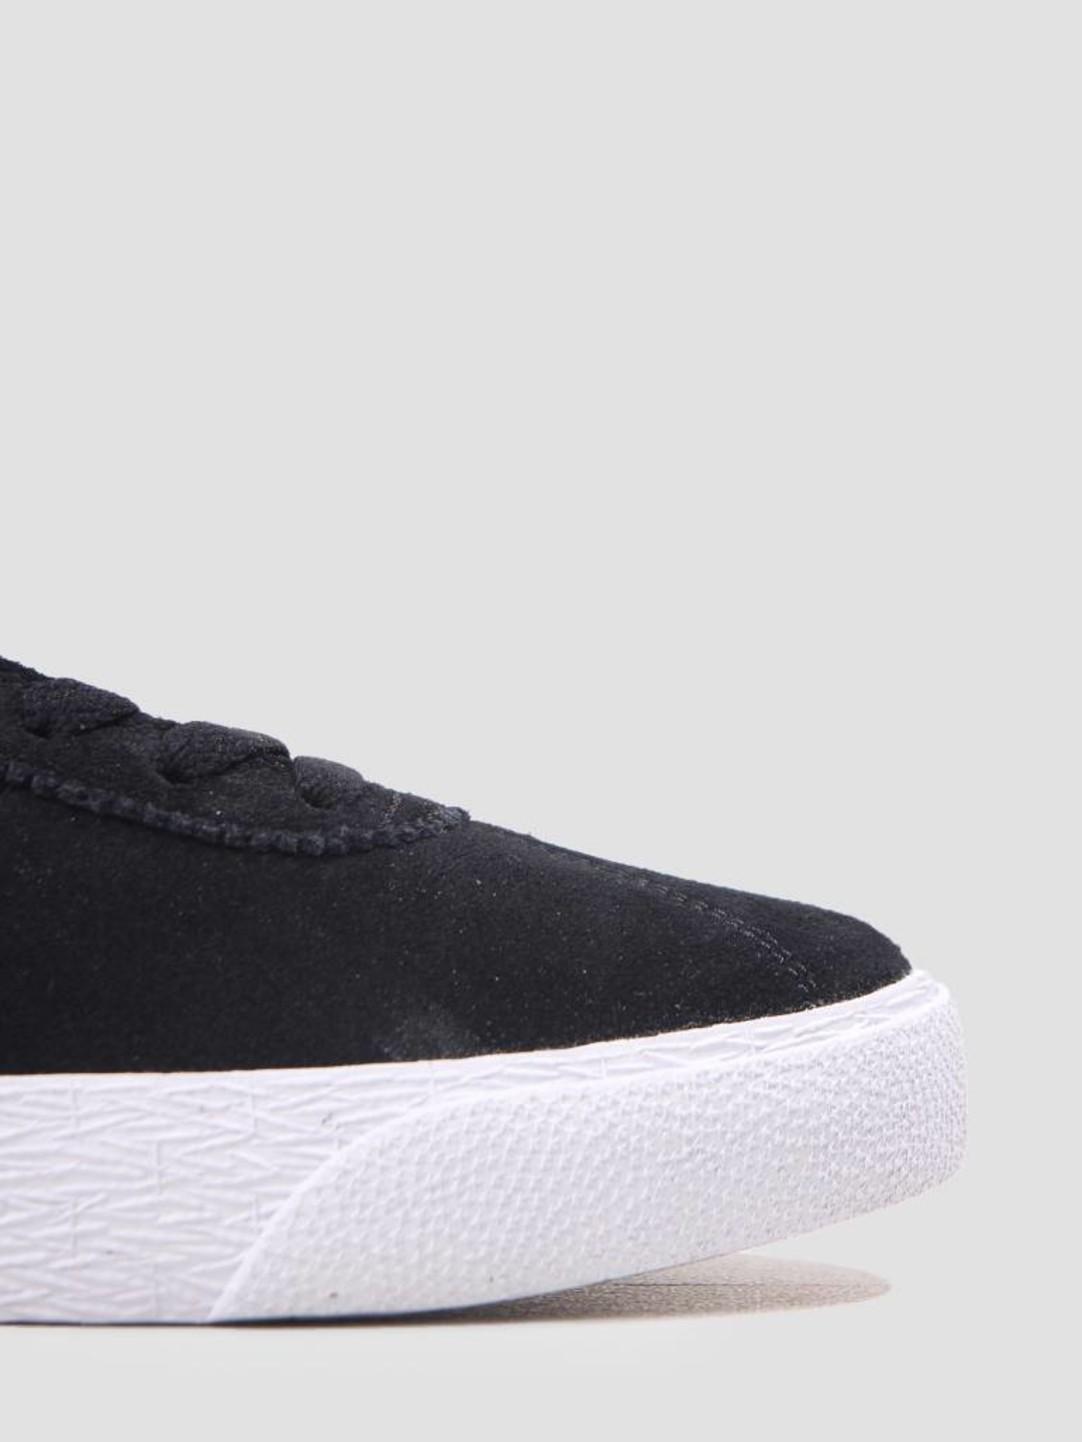 Nike Nike SB Zoom Bruin Black White-Gum Light Brown AQ7941-001